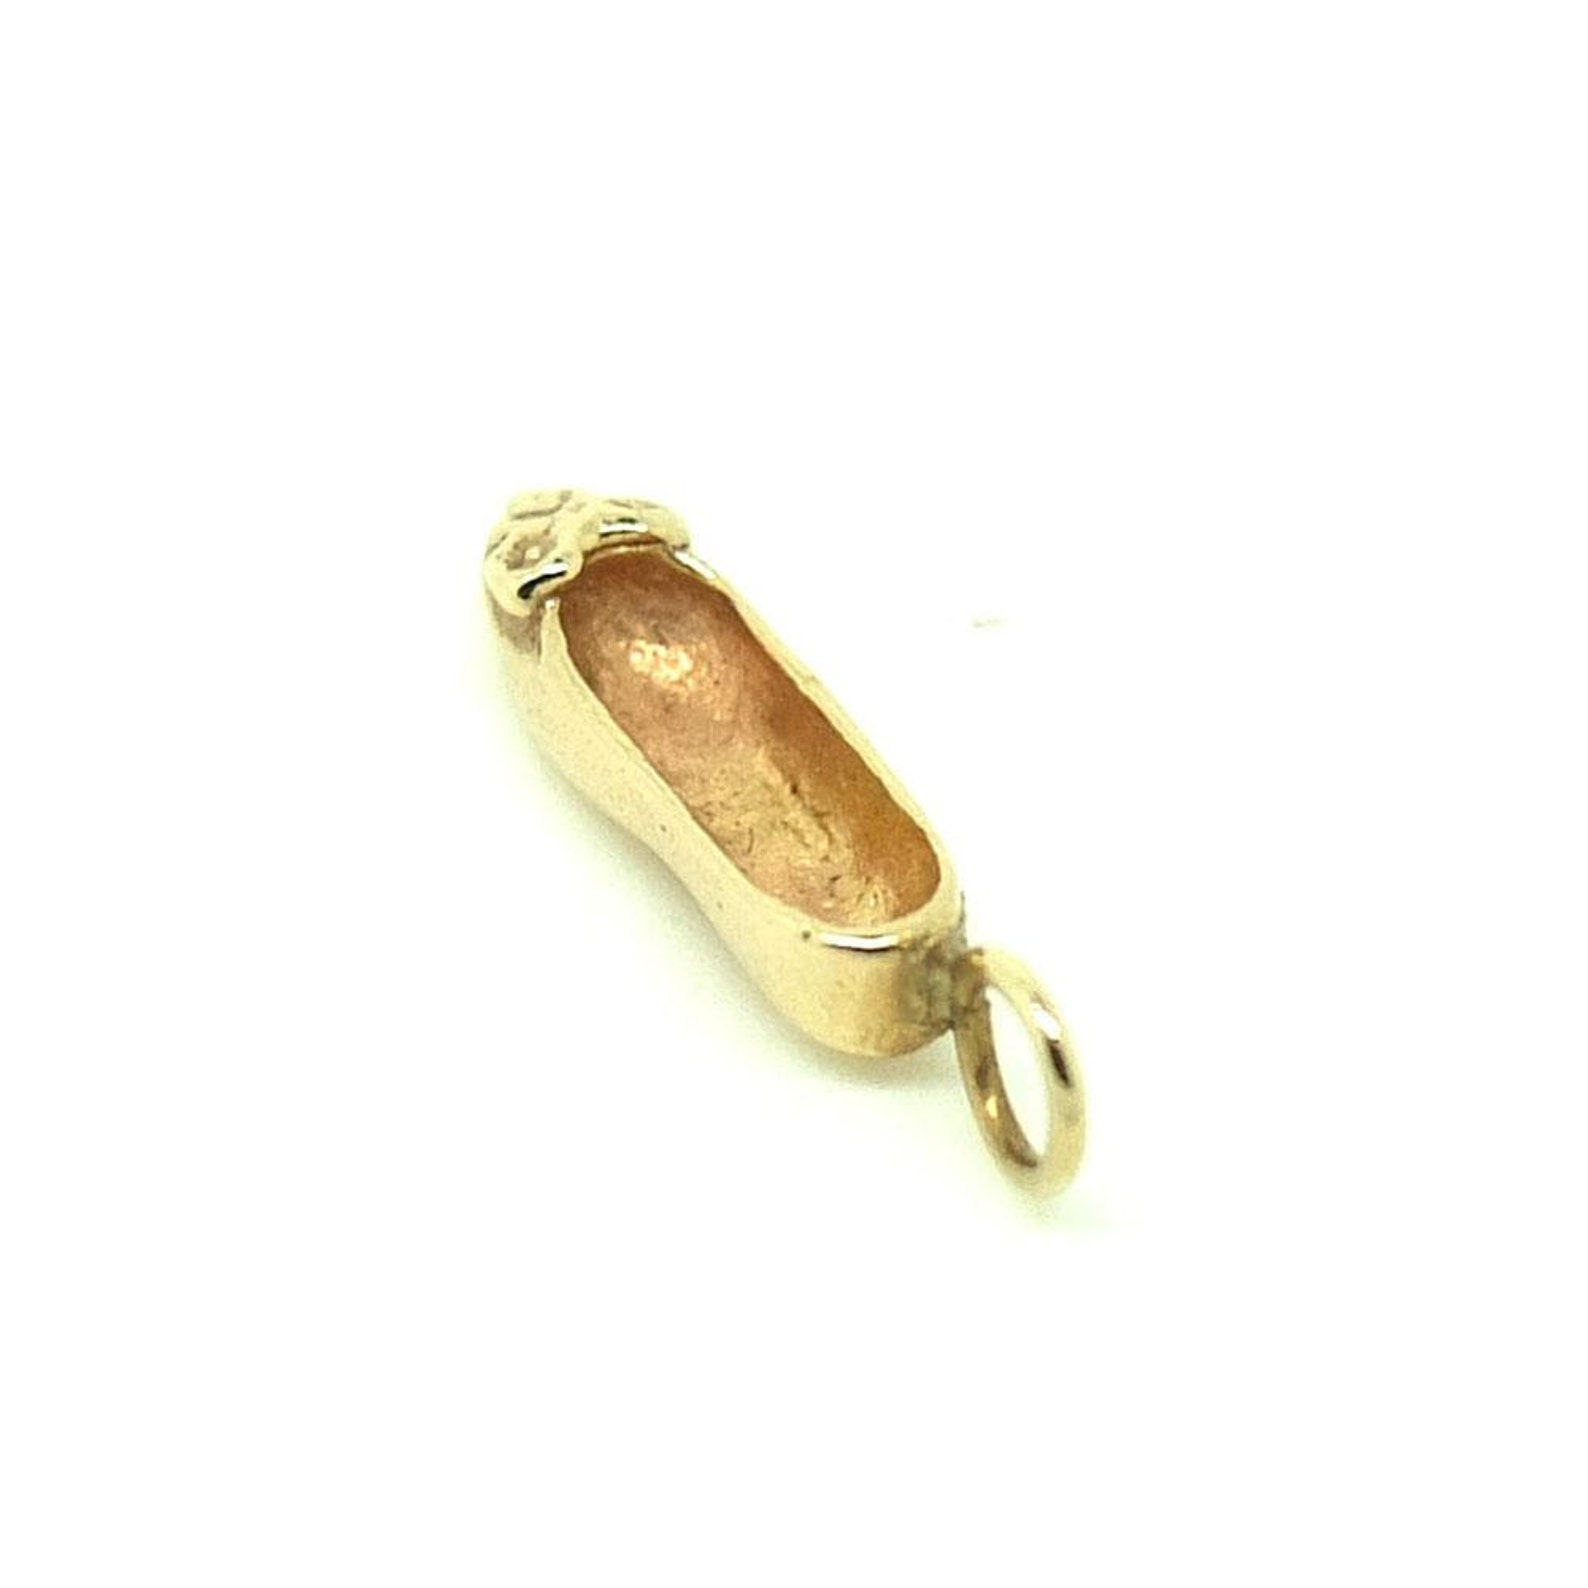 vintage charm necklace   1960s gold charm   ballet shoe   charm necklace   delicate gold necklace   dancing charm